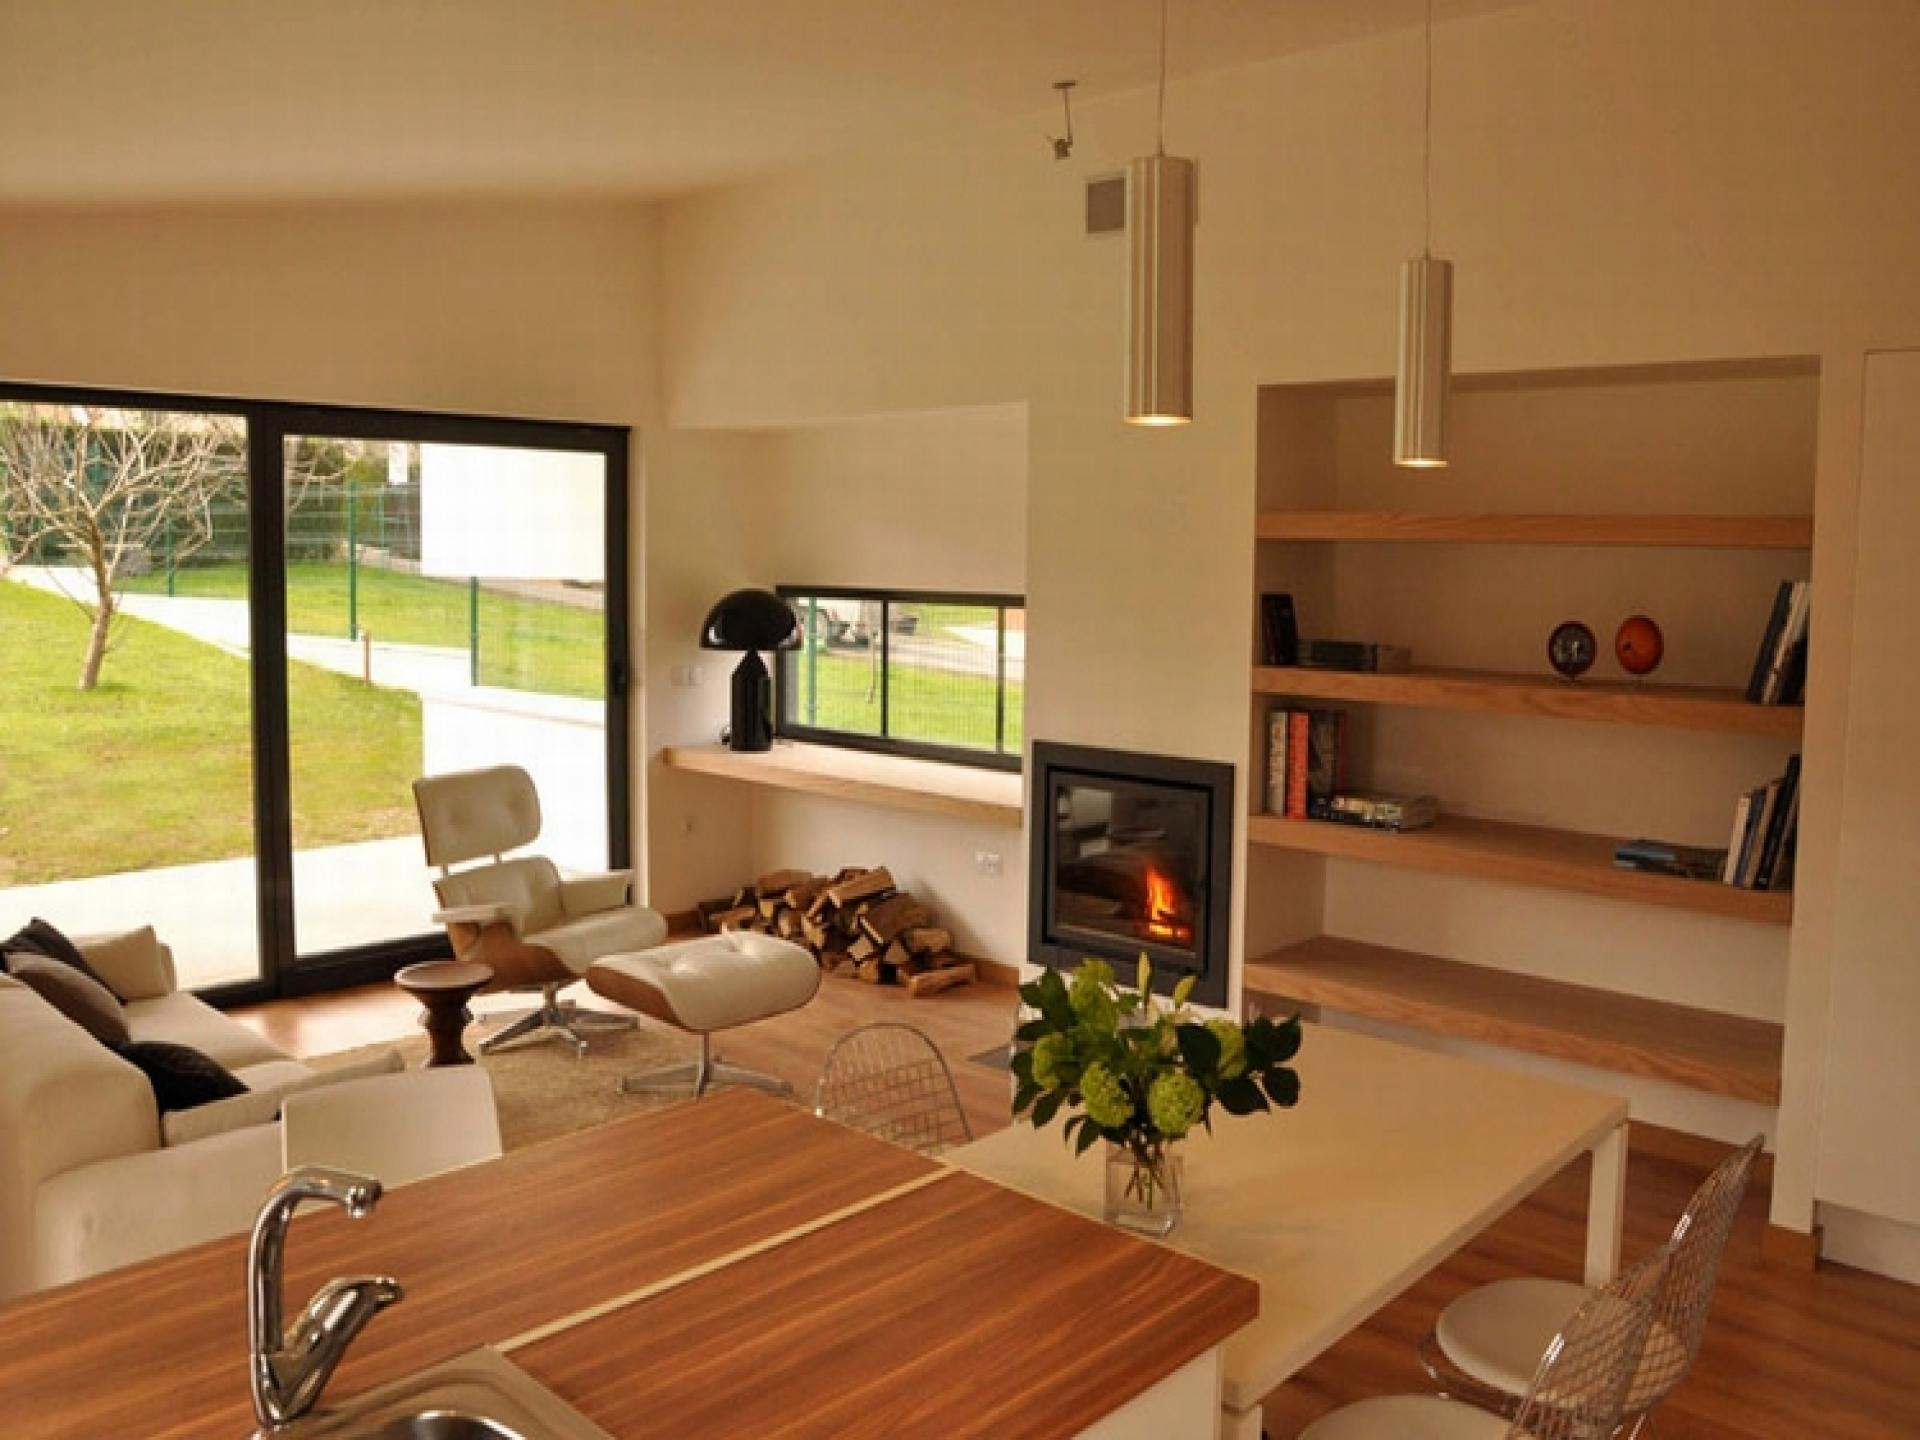 small house interior design flat living room decorating ideas luxury interior design ideas for small EVXPAOZ